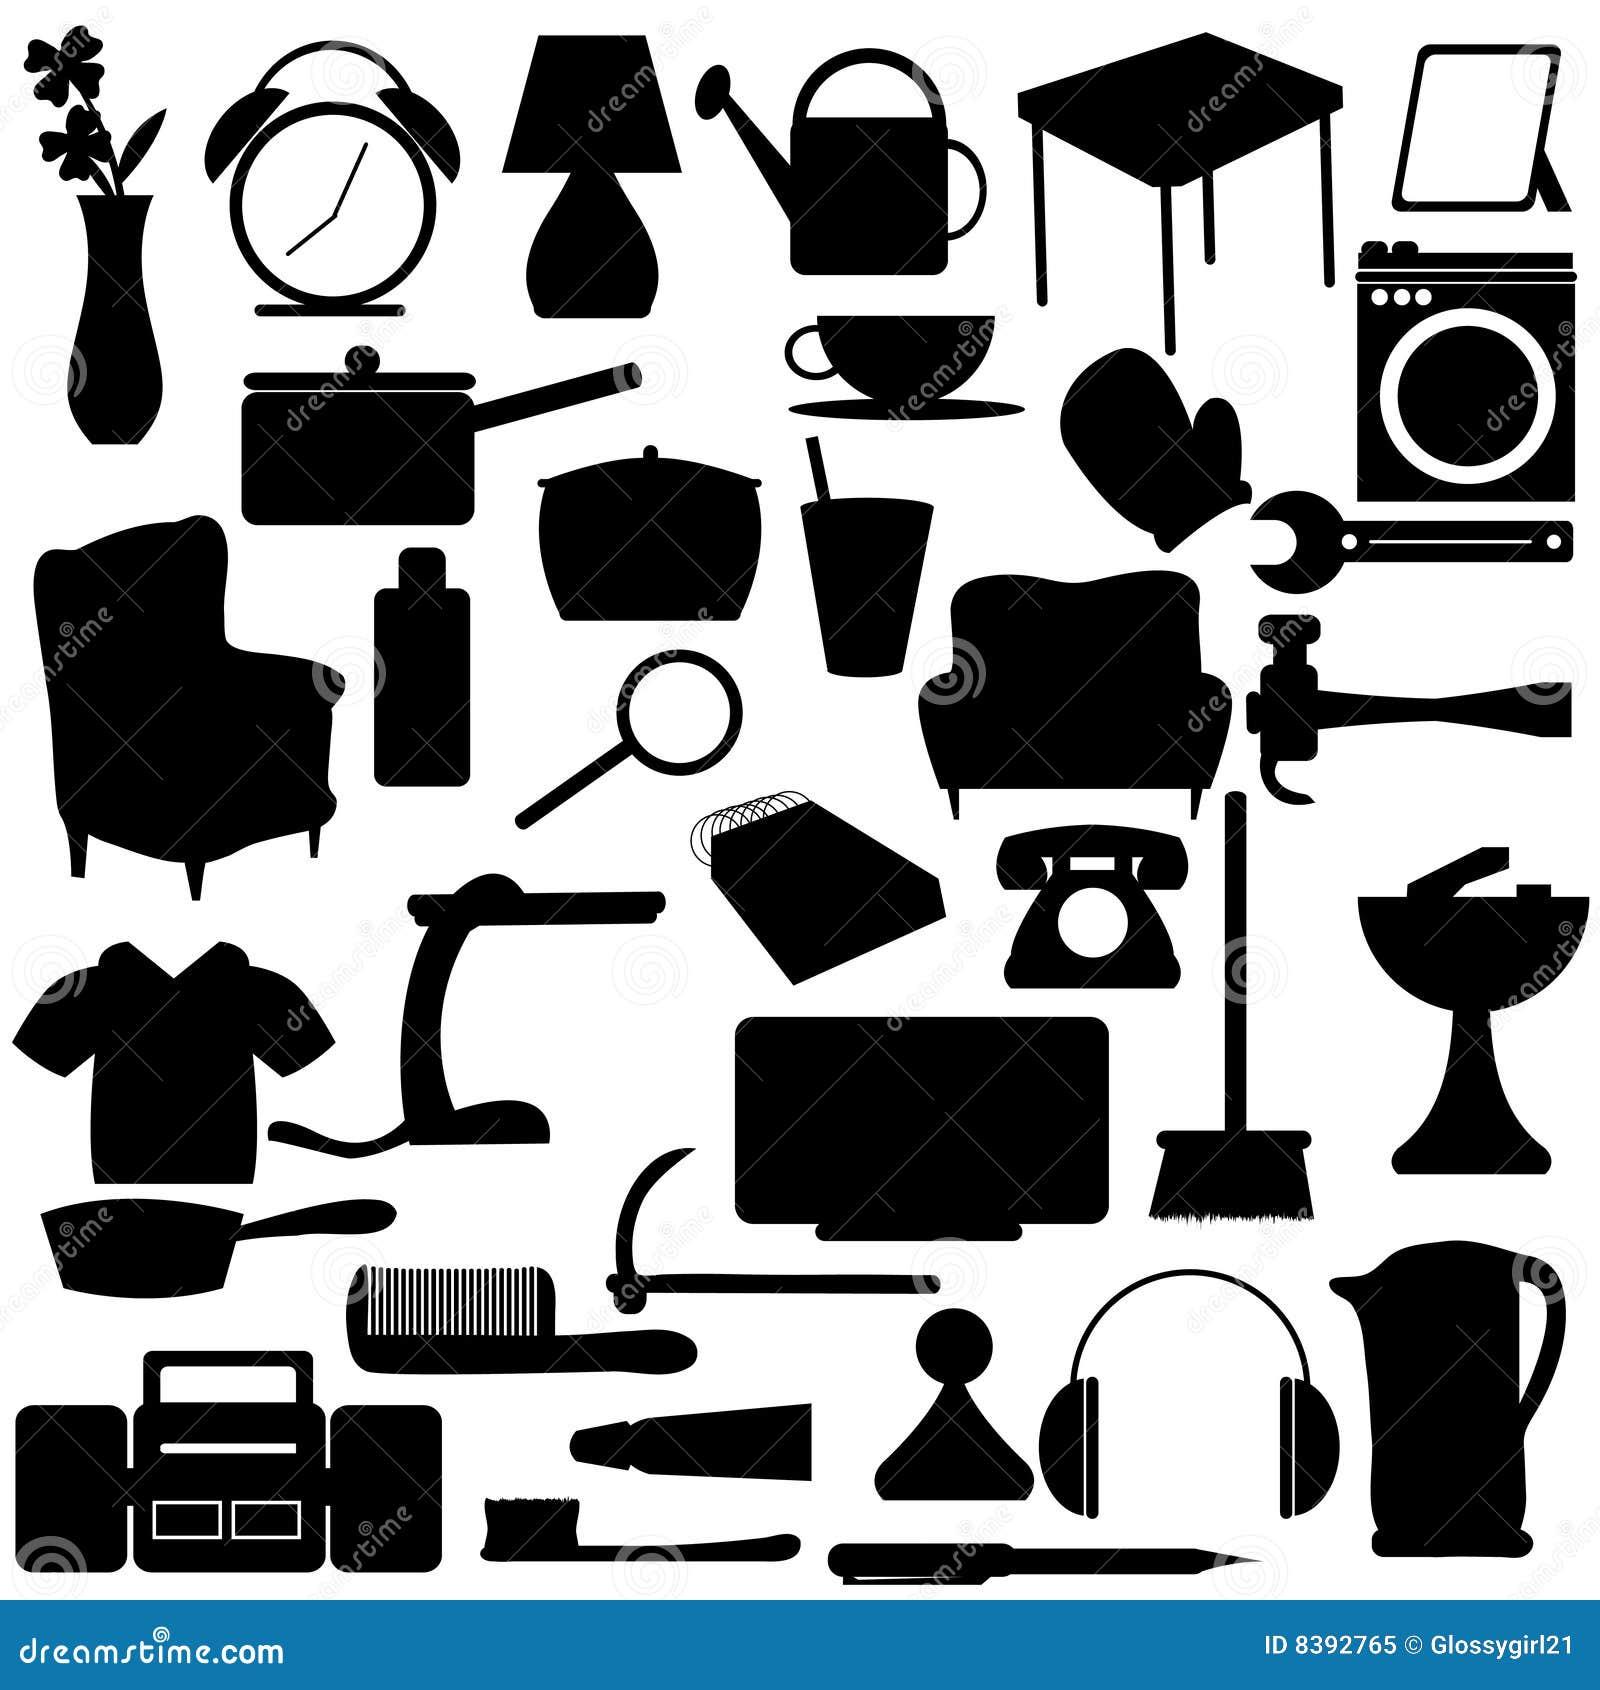 house items clipart - photo #50